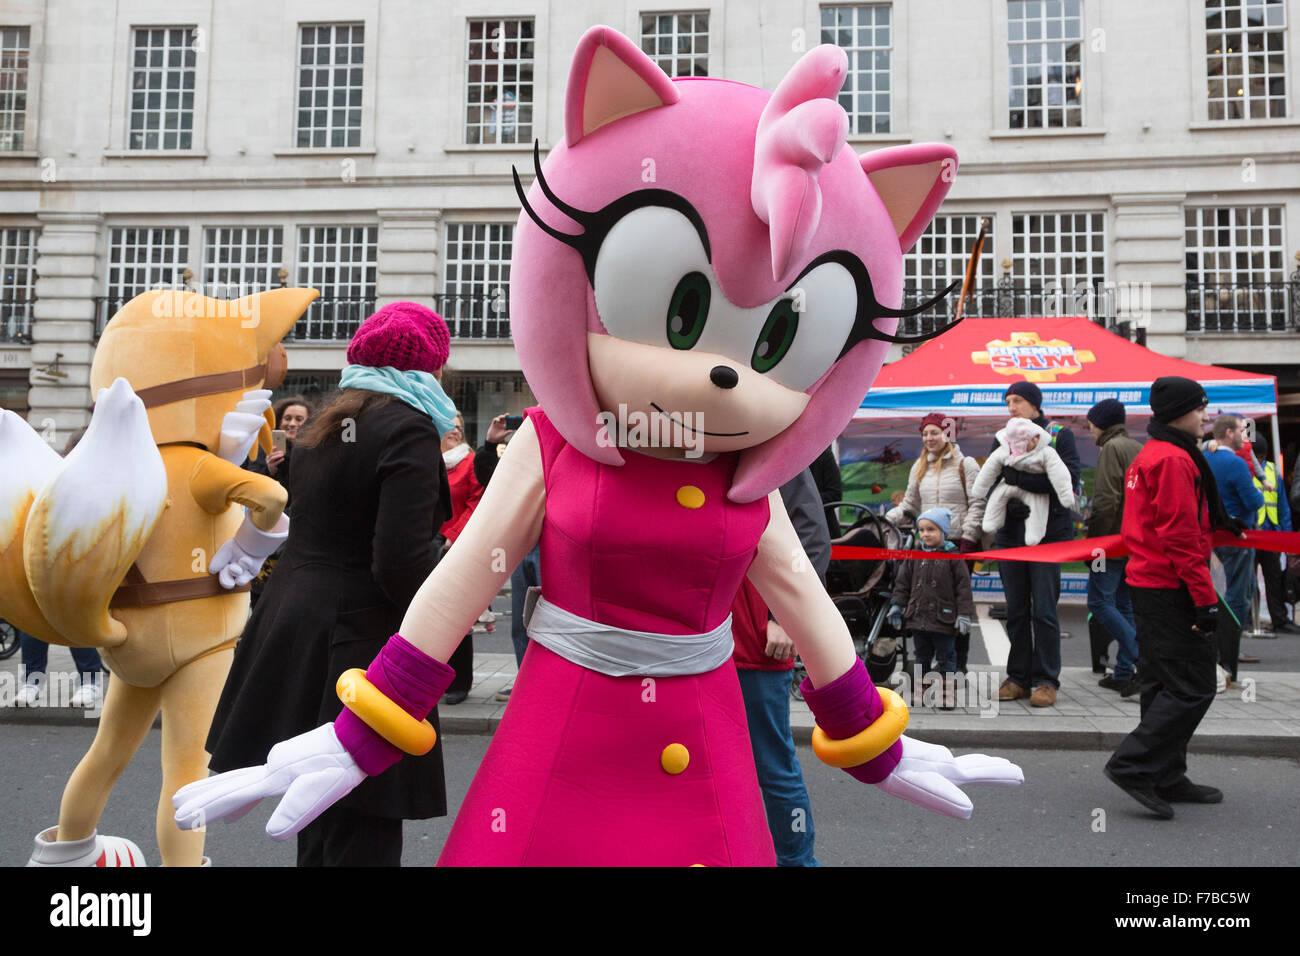 London, UK. 28. November 2015. Charakter ist Amy Rose von Segas ...